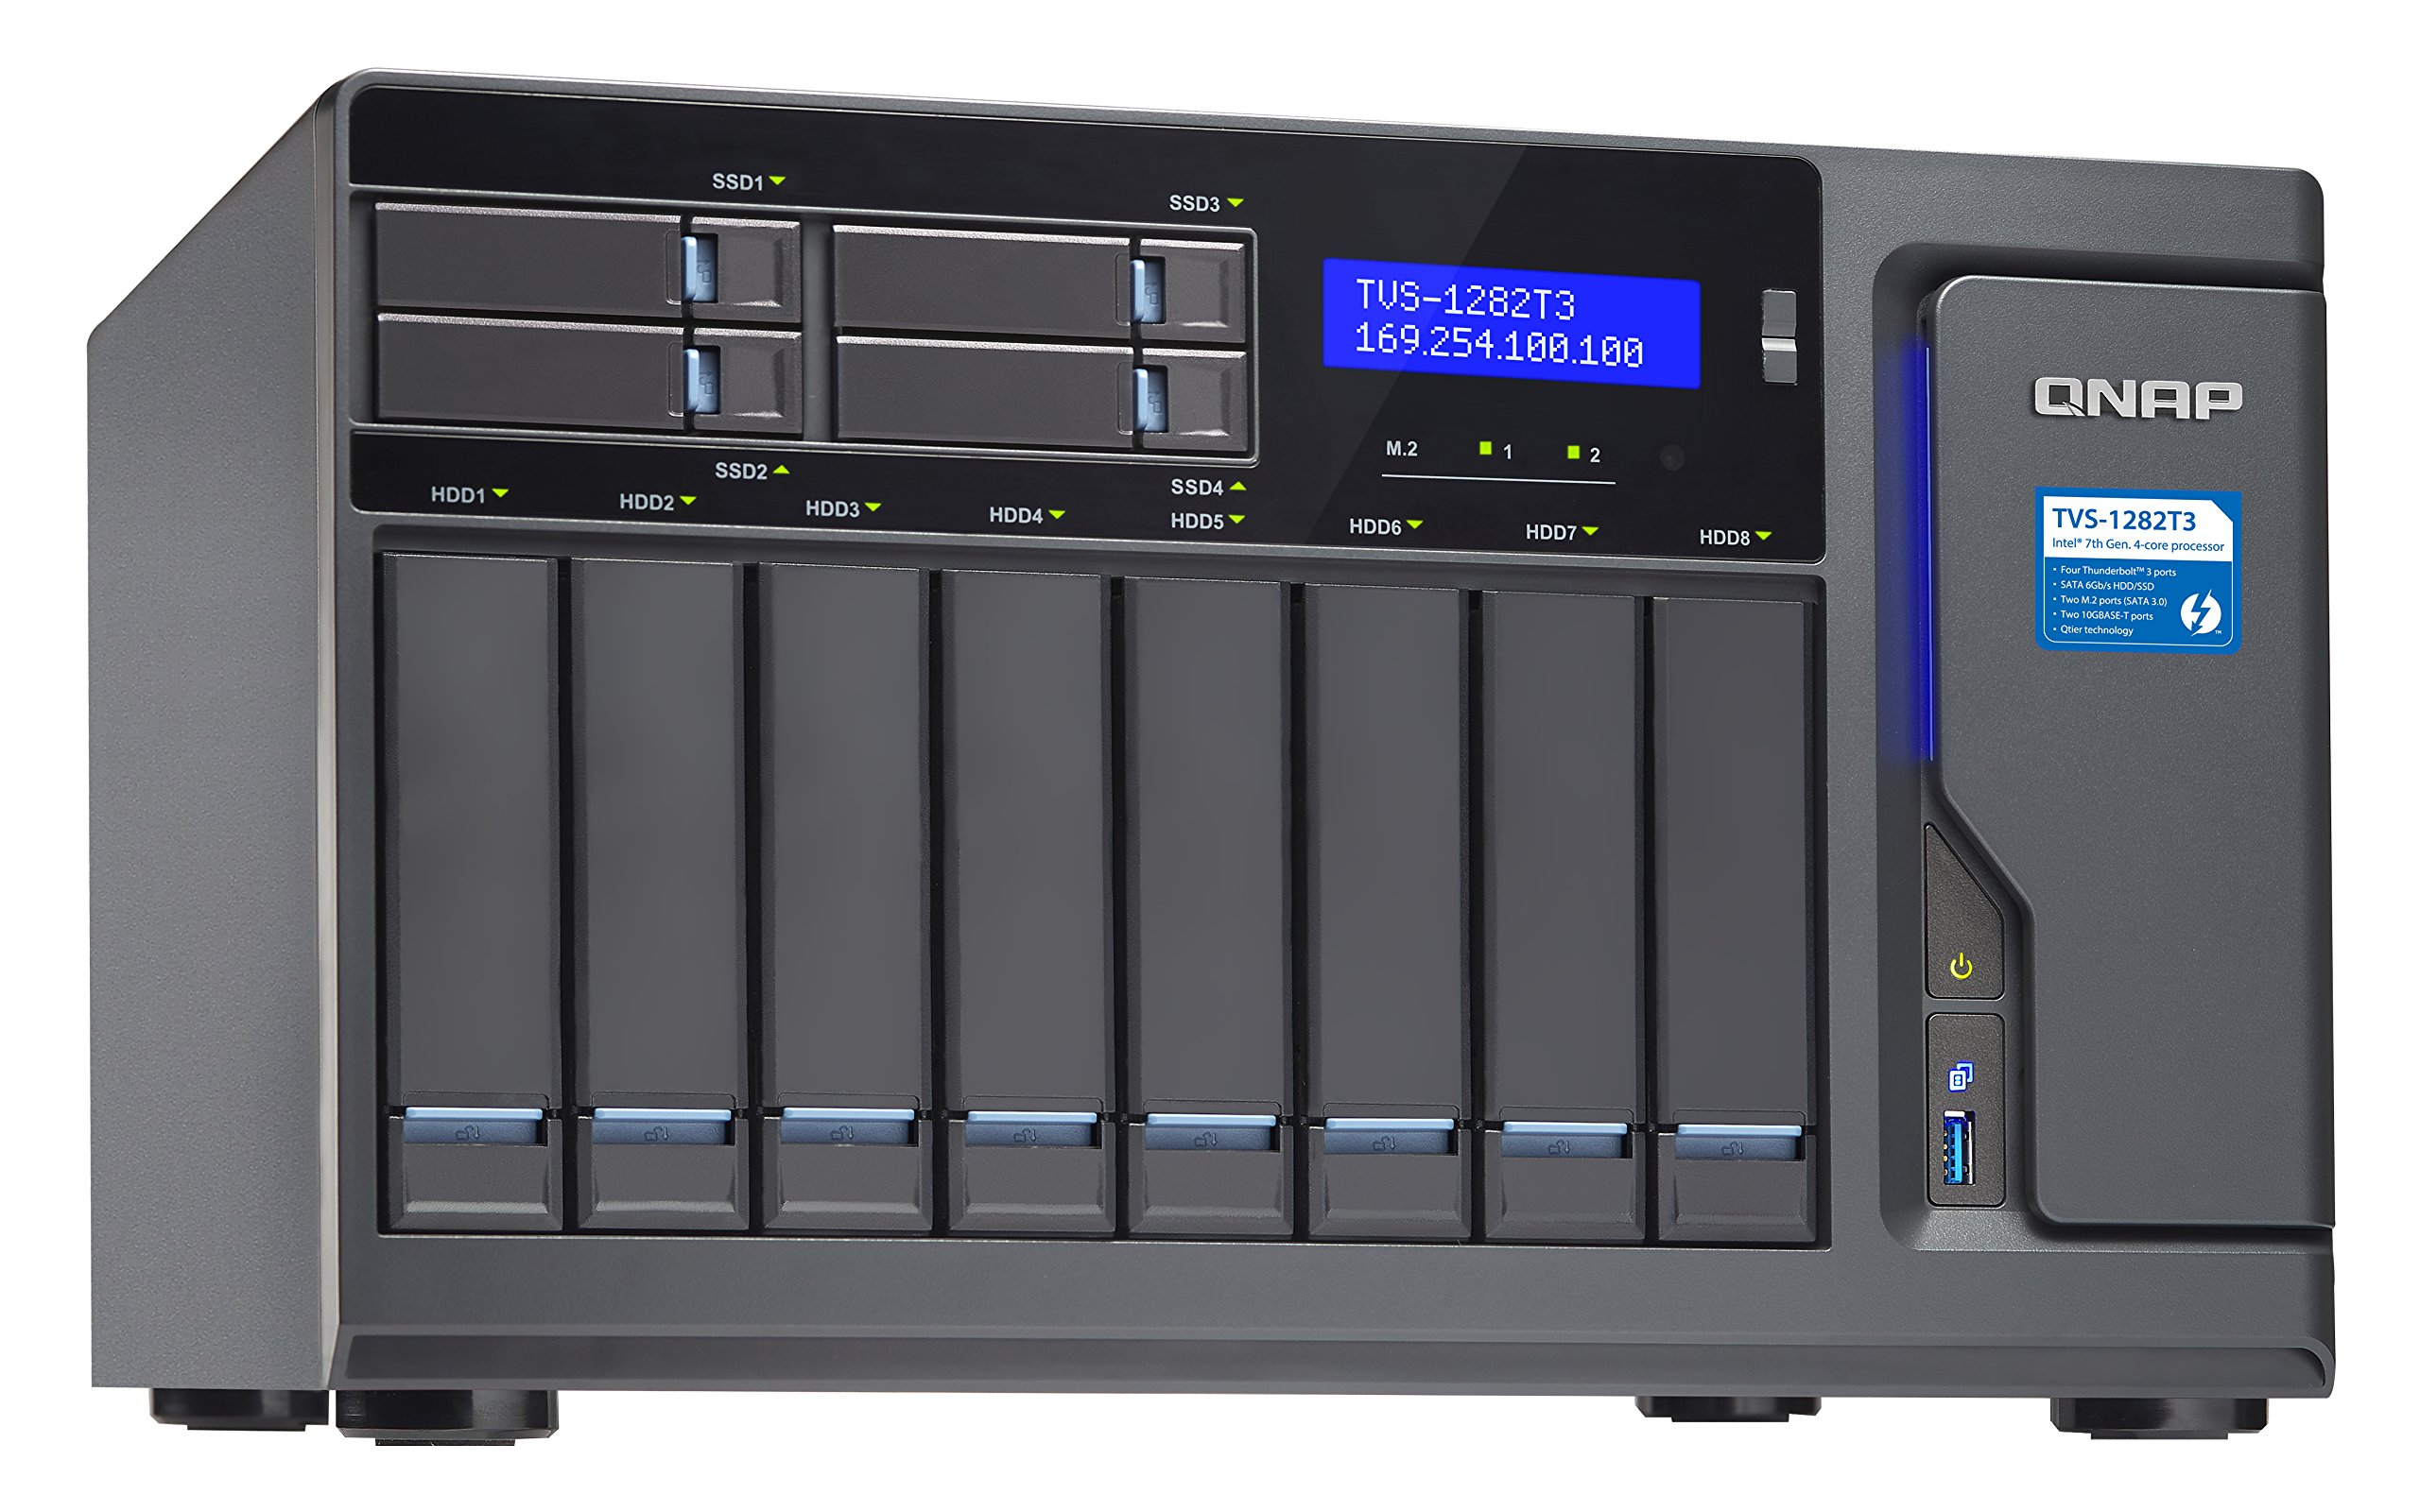 Qnap TVS-1282T3-i7-64G-US Ultra-High Speed 12 bay (8+4) Thunderbolt 3 NAS/iSCSI IP-SAN, Intel 7th Gen Kaby Lake Core i7 3.6GHz Quad Core, 64GB RAM, Thunderbolt3 port x 4 and 10Gbase-T x 2 by QNAP (Image #5)